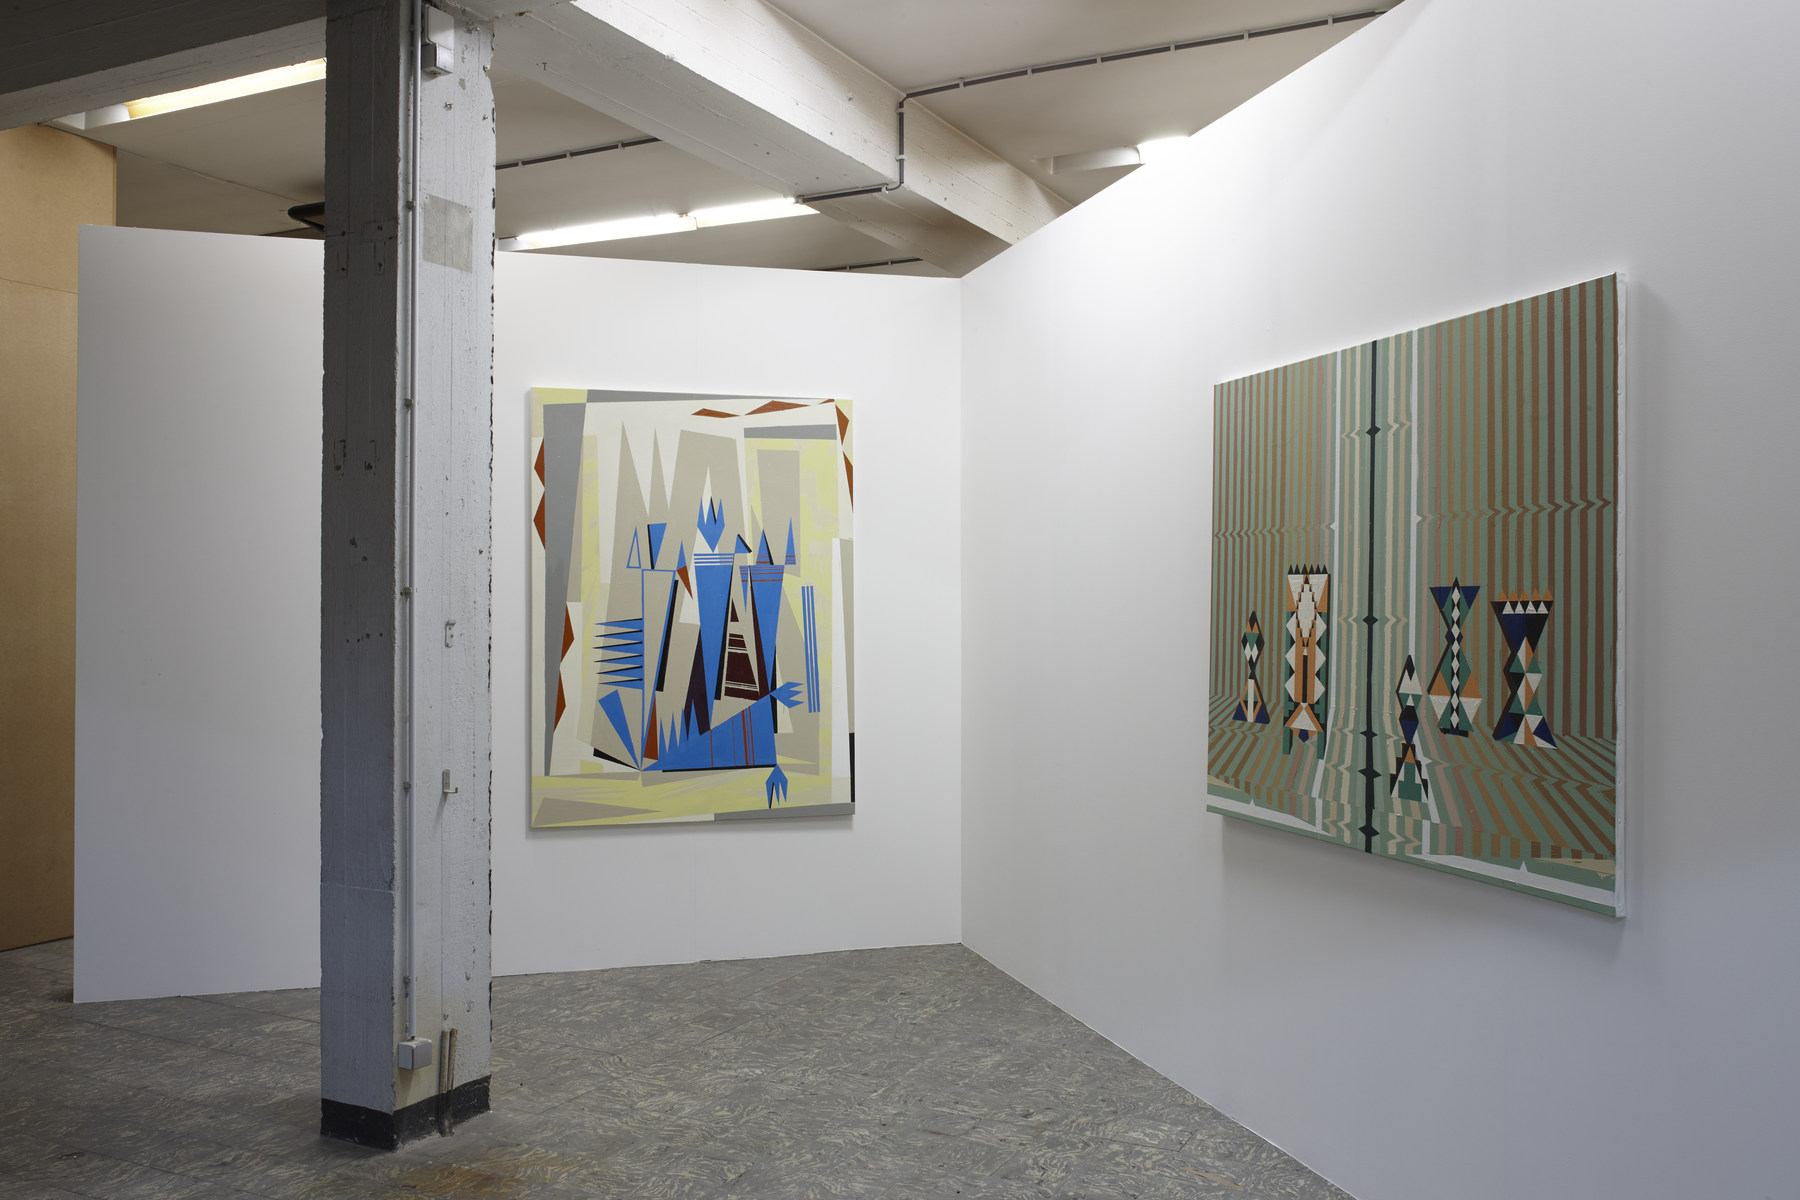 Farah Atassi, 'Hypnotic Setting', 2015, 'Ballet', 2015, in 'Farah Atassi', installation view, Extra City Kunsthal, 2015 © Jan Kempenaers